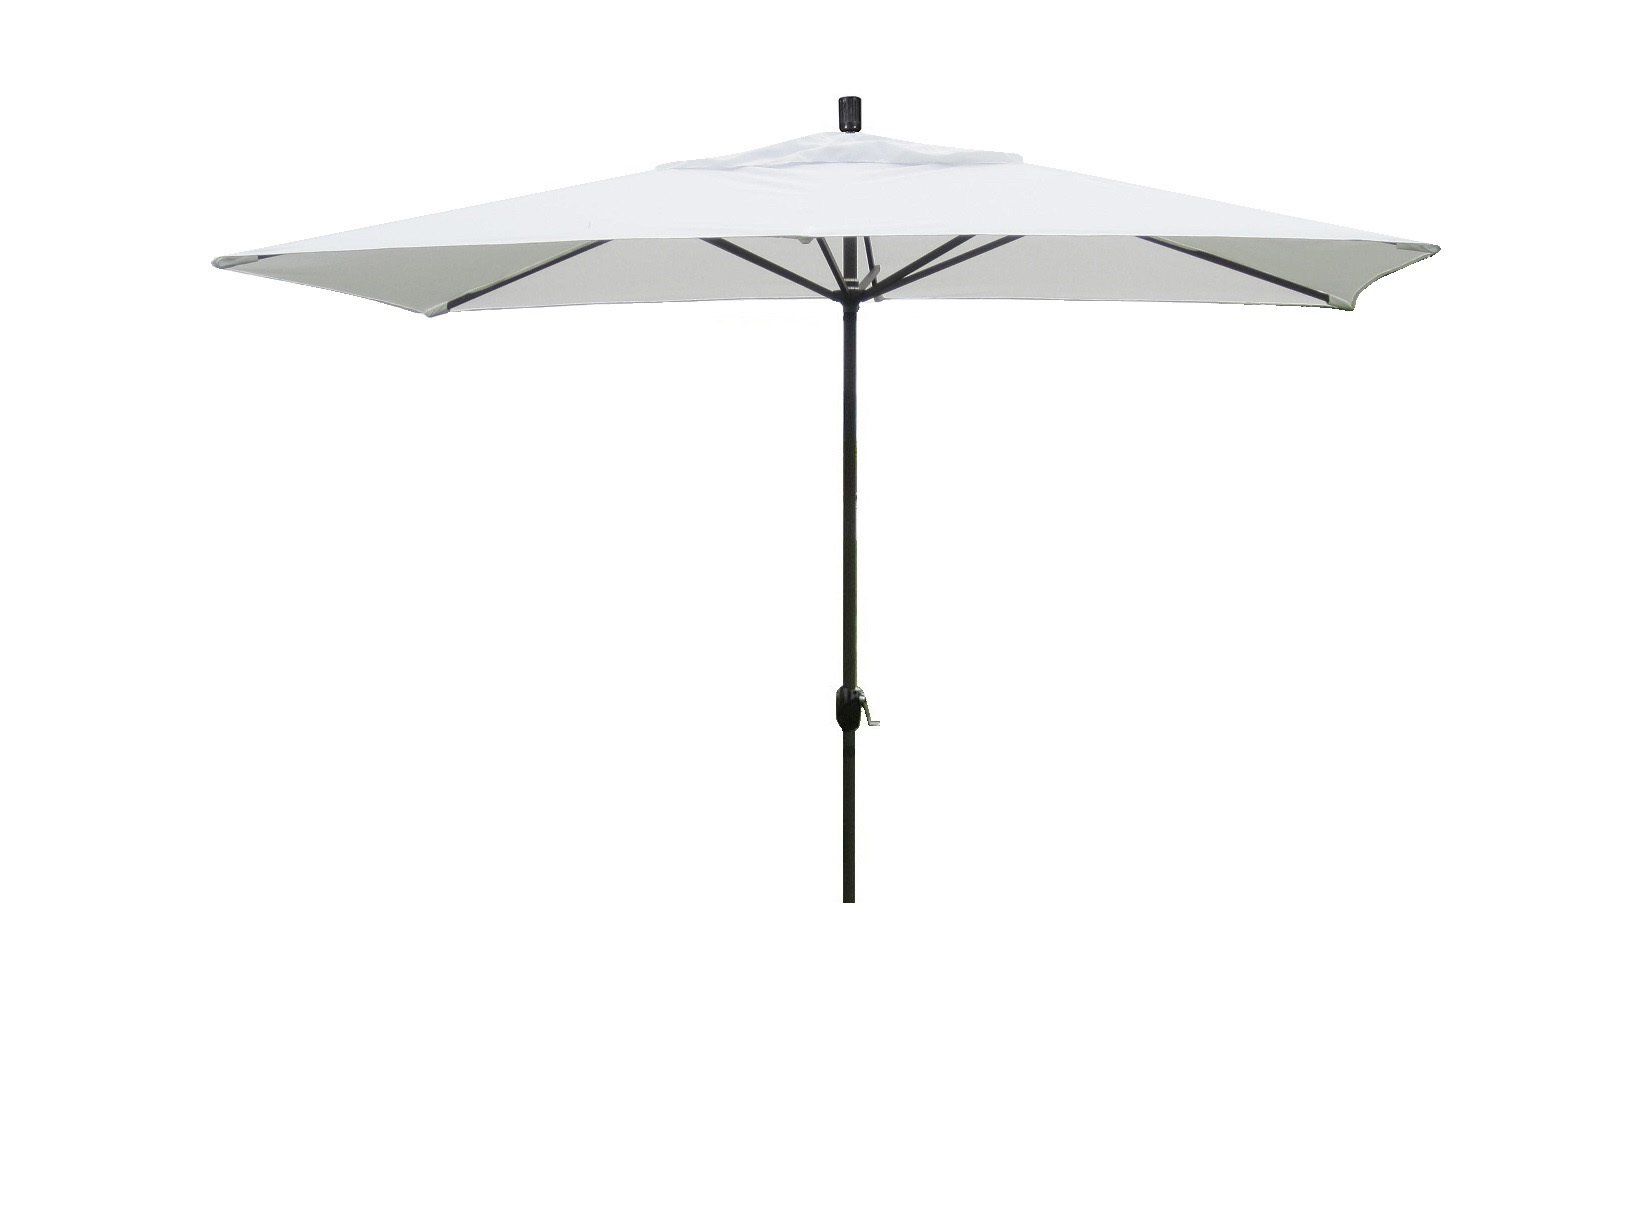 Lonoke Patio Rectangular Market Umbrellas Regarding 2019 Northfleet 10' X 6' Rectangular Market Umbrella (View 9 of 20)